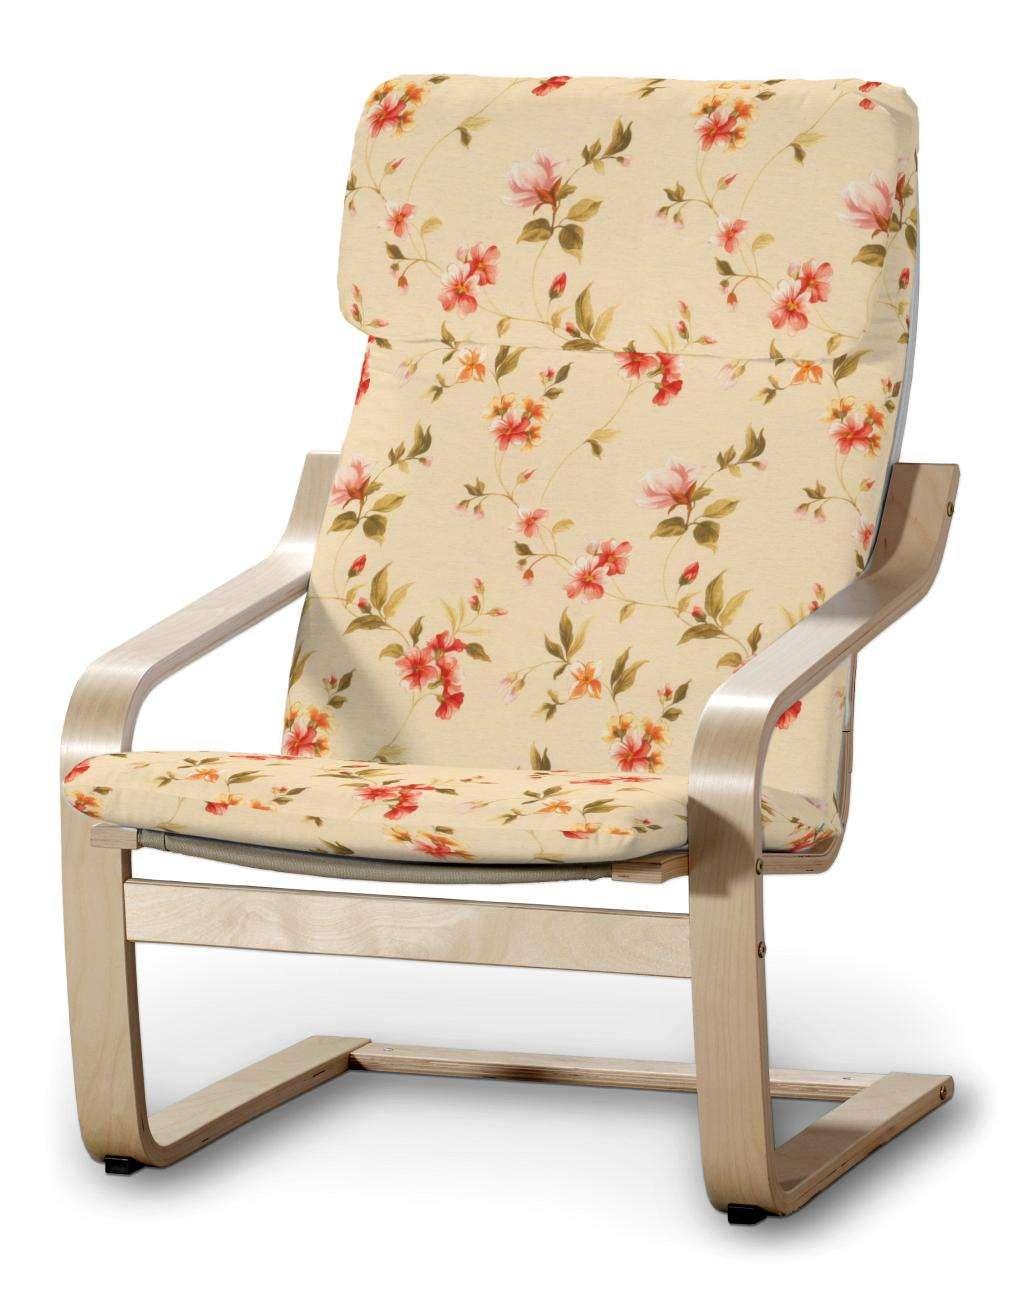 POÄNG  fotelio užvalkalas Poäng armchair kolekcijoje Londres, audinys: 124-05